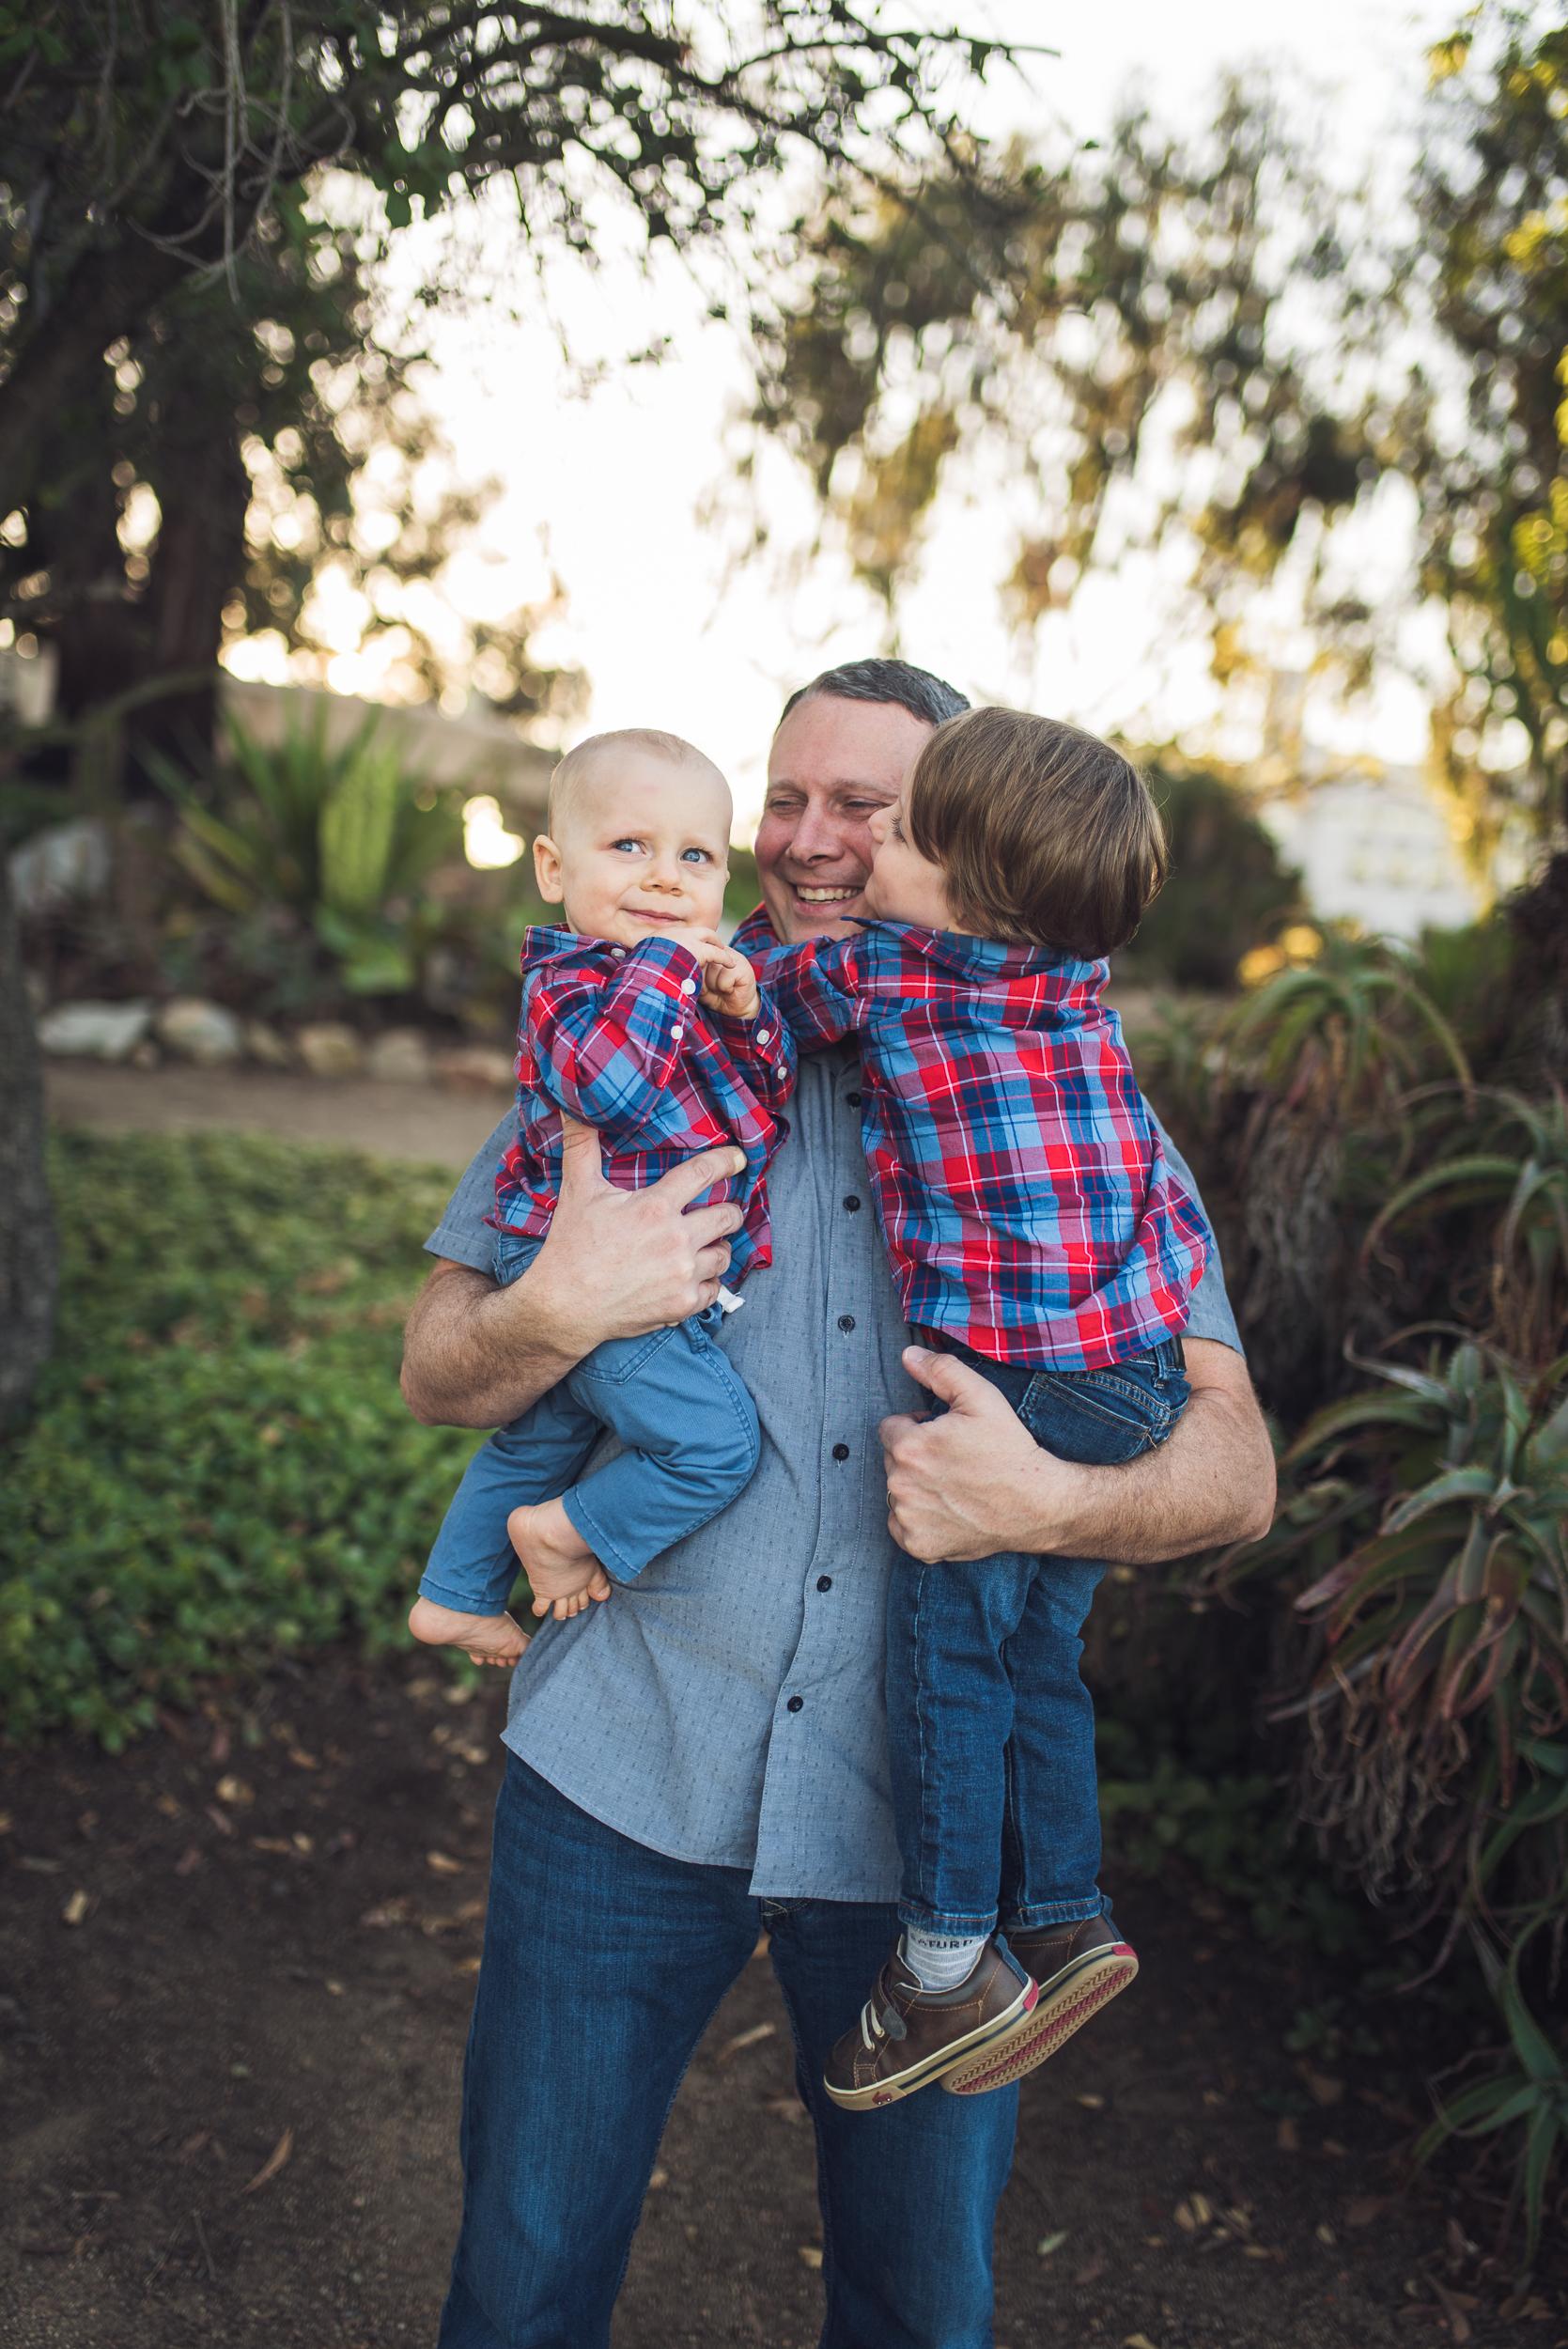 2018-San-Diego-Family-Lifestyle-Newborn-Travel-Vacation-Photographer-Kelsey-Smith-Photography-Coronado-La-Jolla-Encinitas-Solana-Beach-Del-Mar-173.jpg